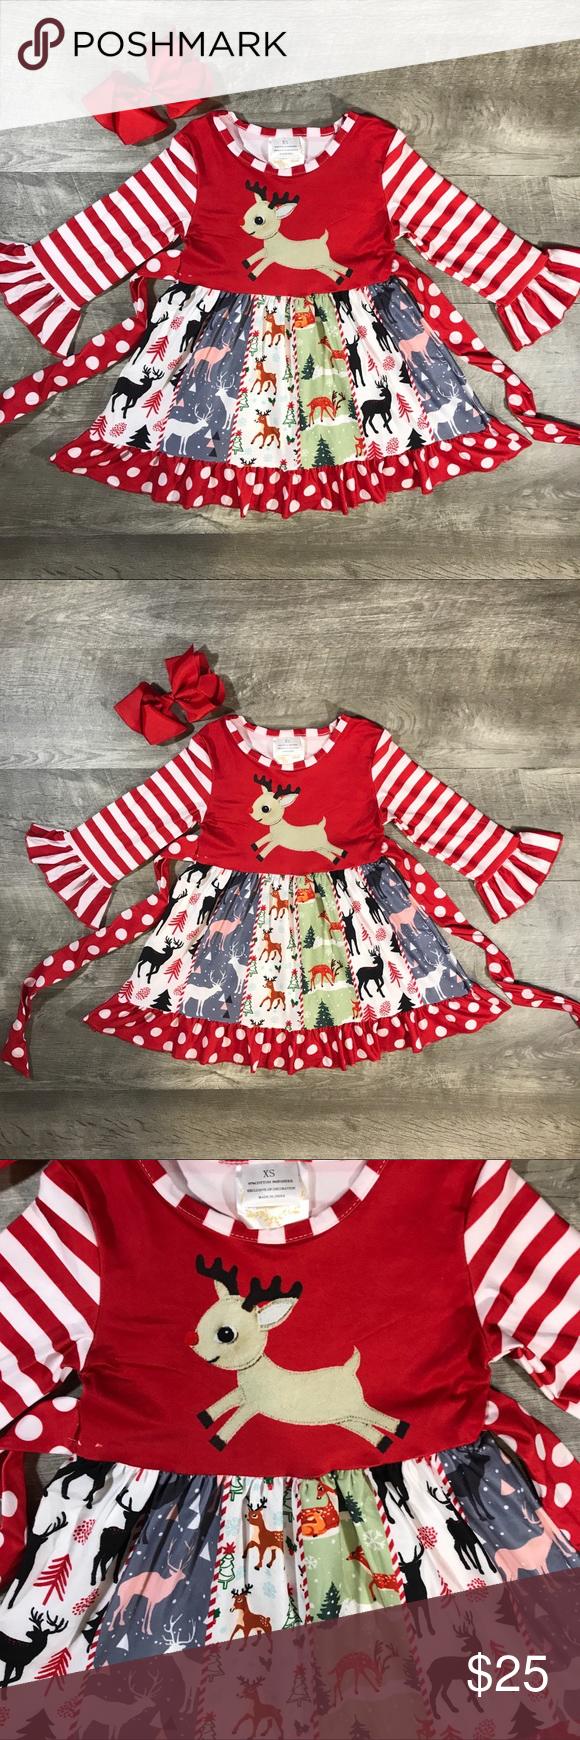 Christmas Twirl Dress Rudolph Reindeer Dress Red White Stripe Dress